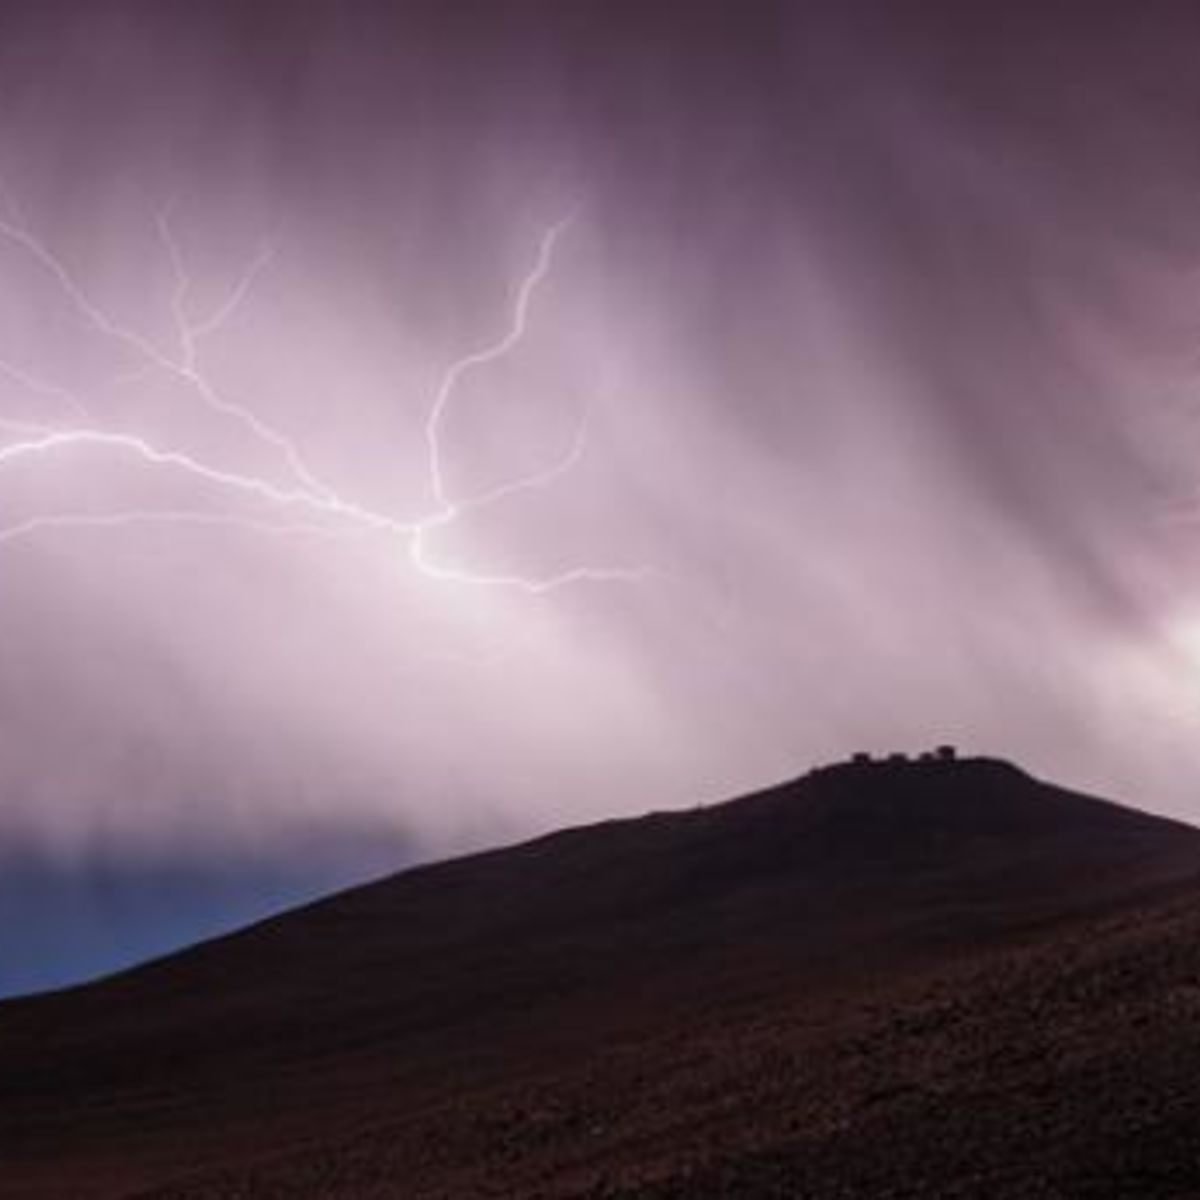 paranal_lightning.jpg.CROP.rectangle-large_0.jpg